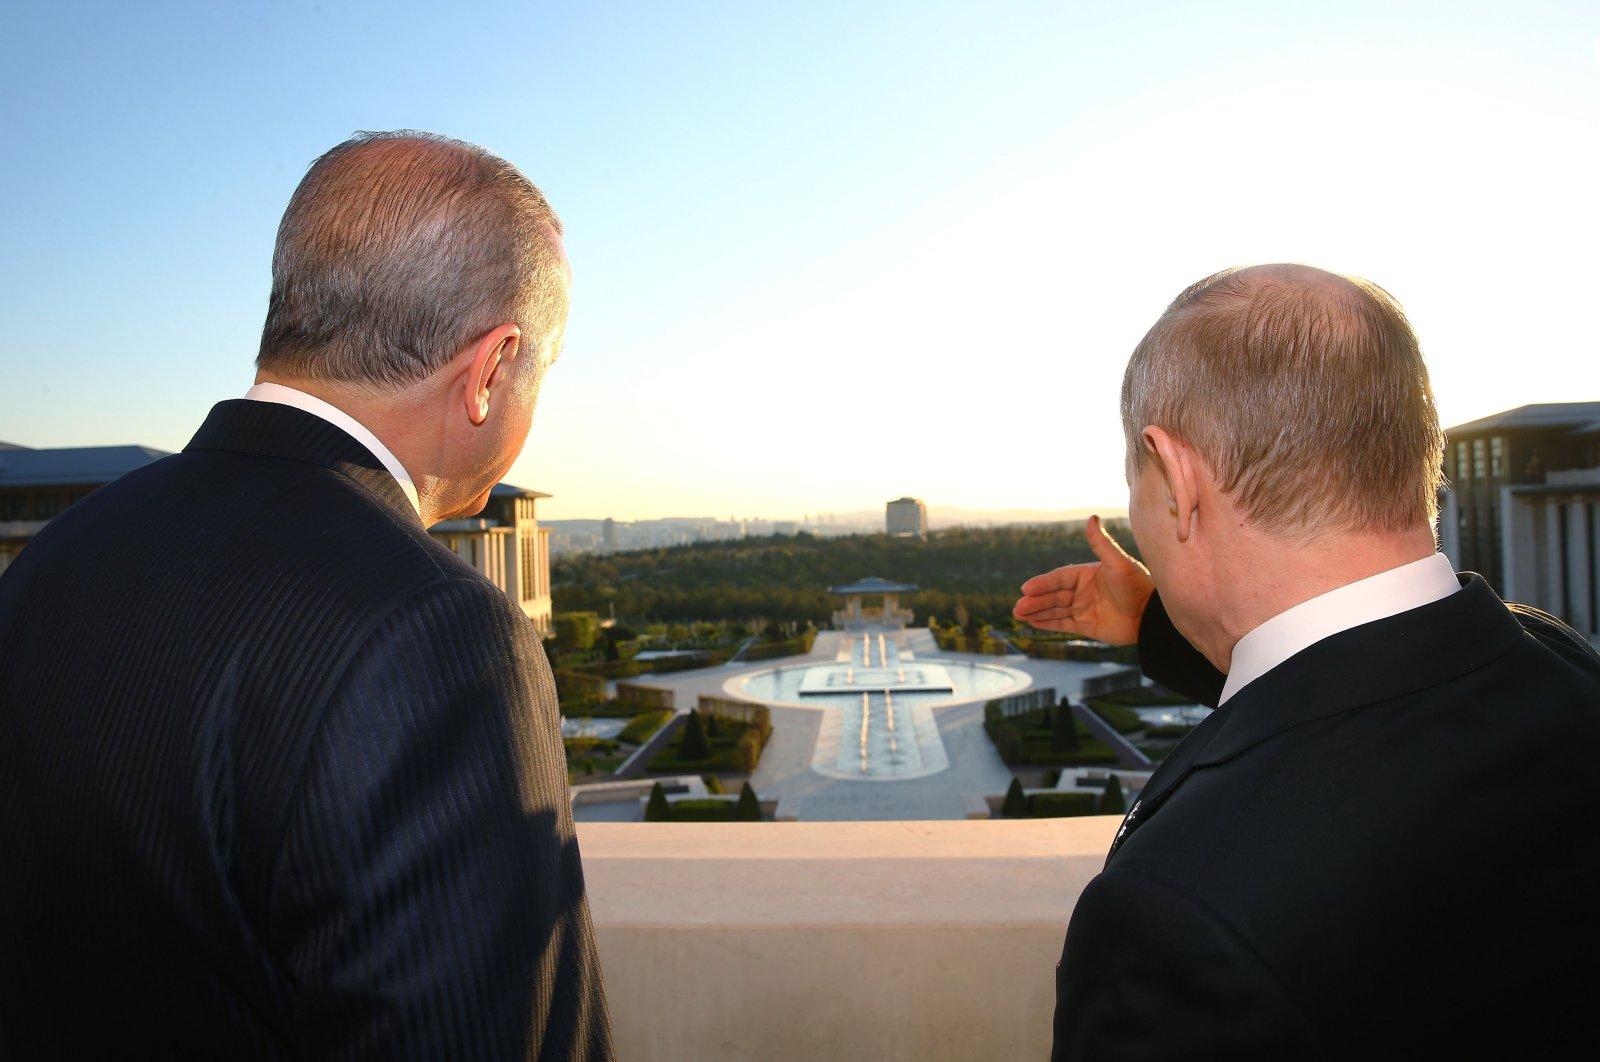 President Recep Tayyip Erdoğan and Russia's Vladimir Putin at the Presidential Complex in Ankara, Turkey, April 3, 2018. (Courtesy of the Presidency)